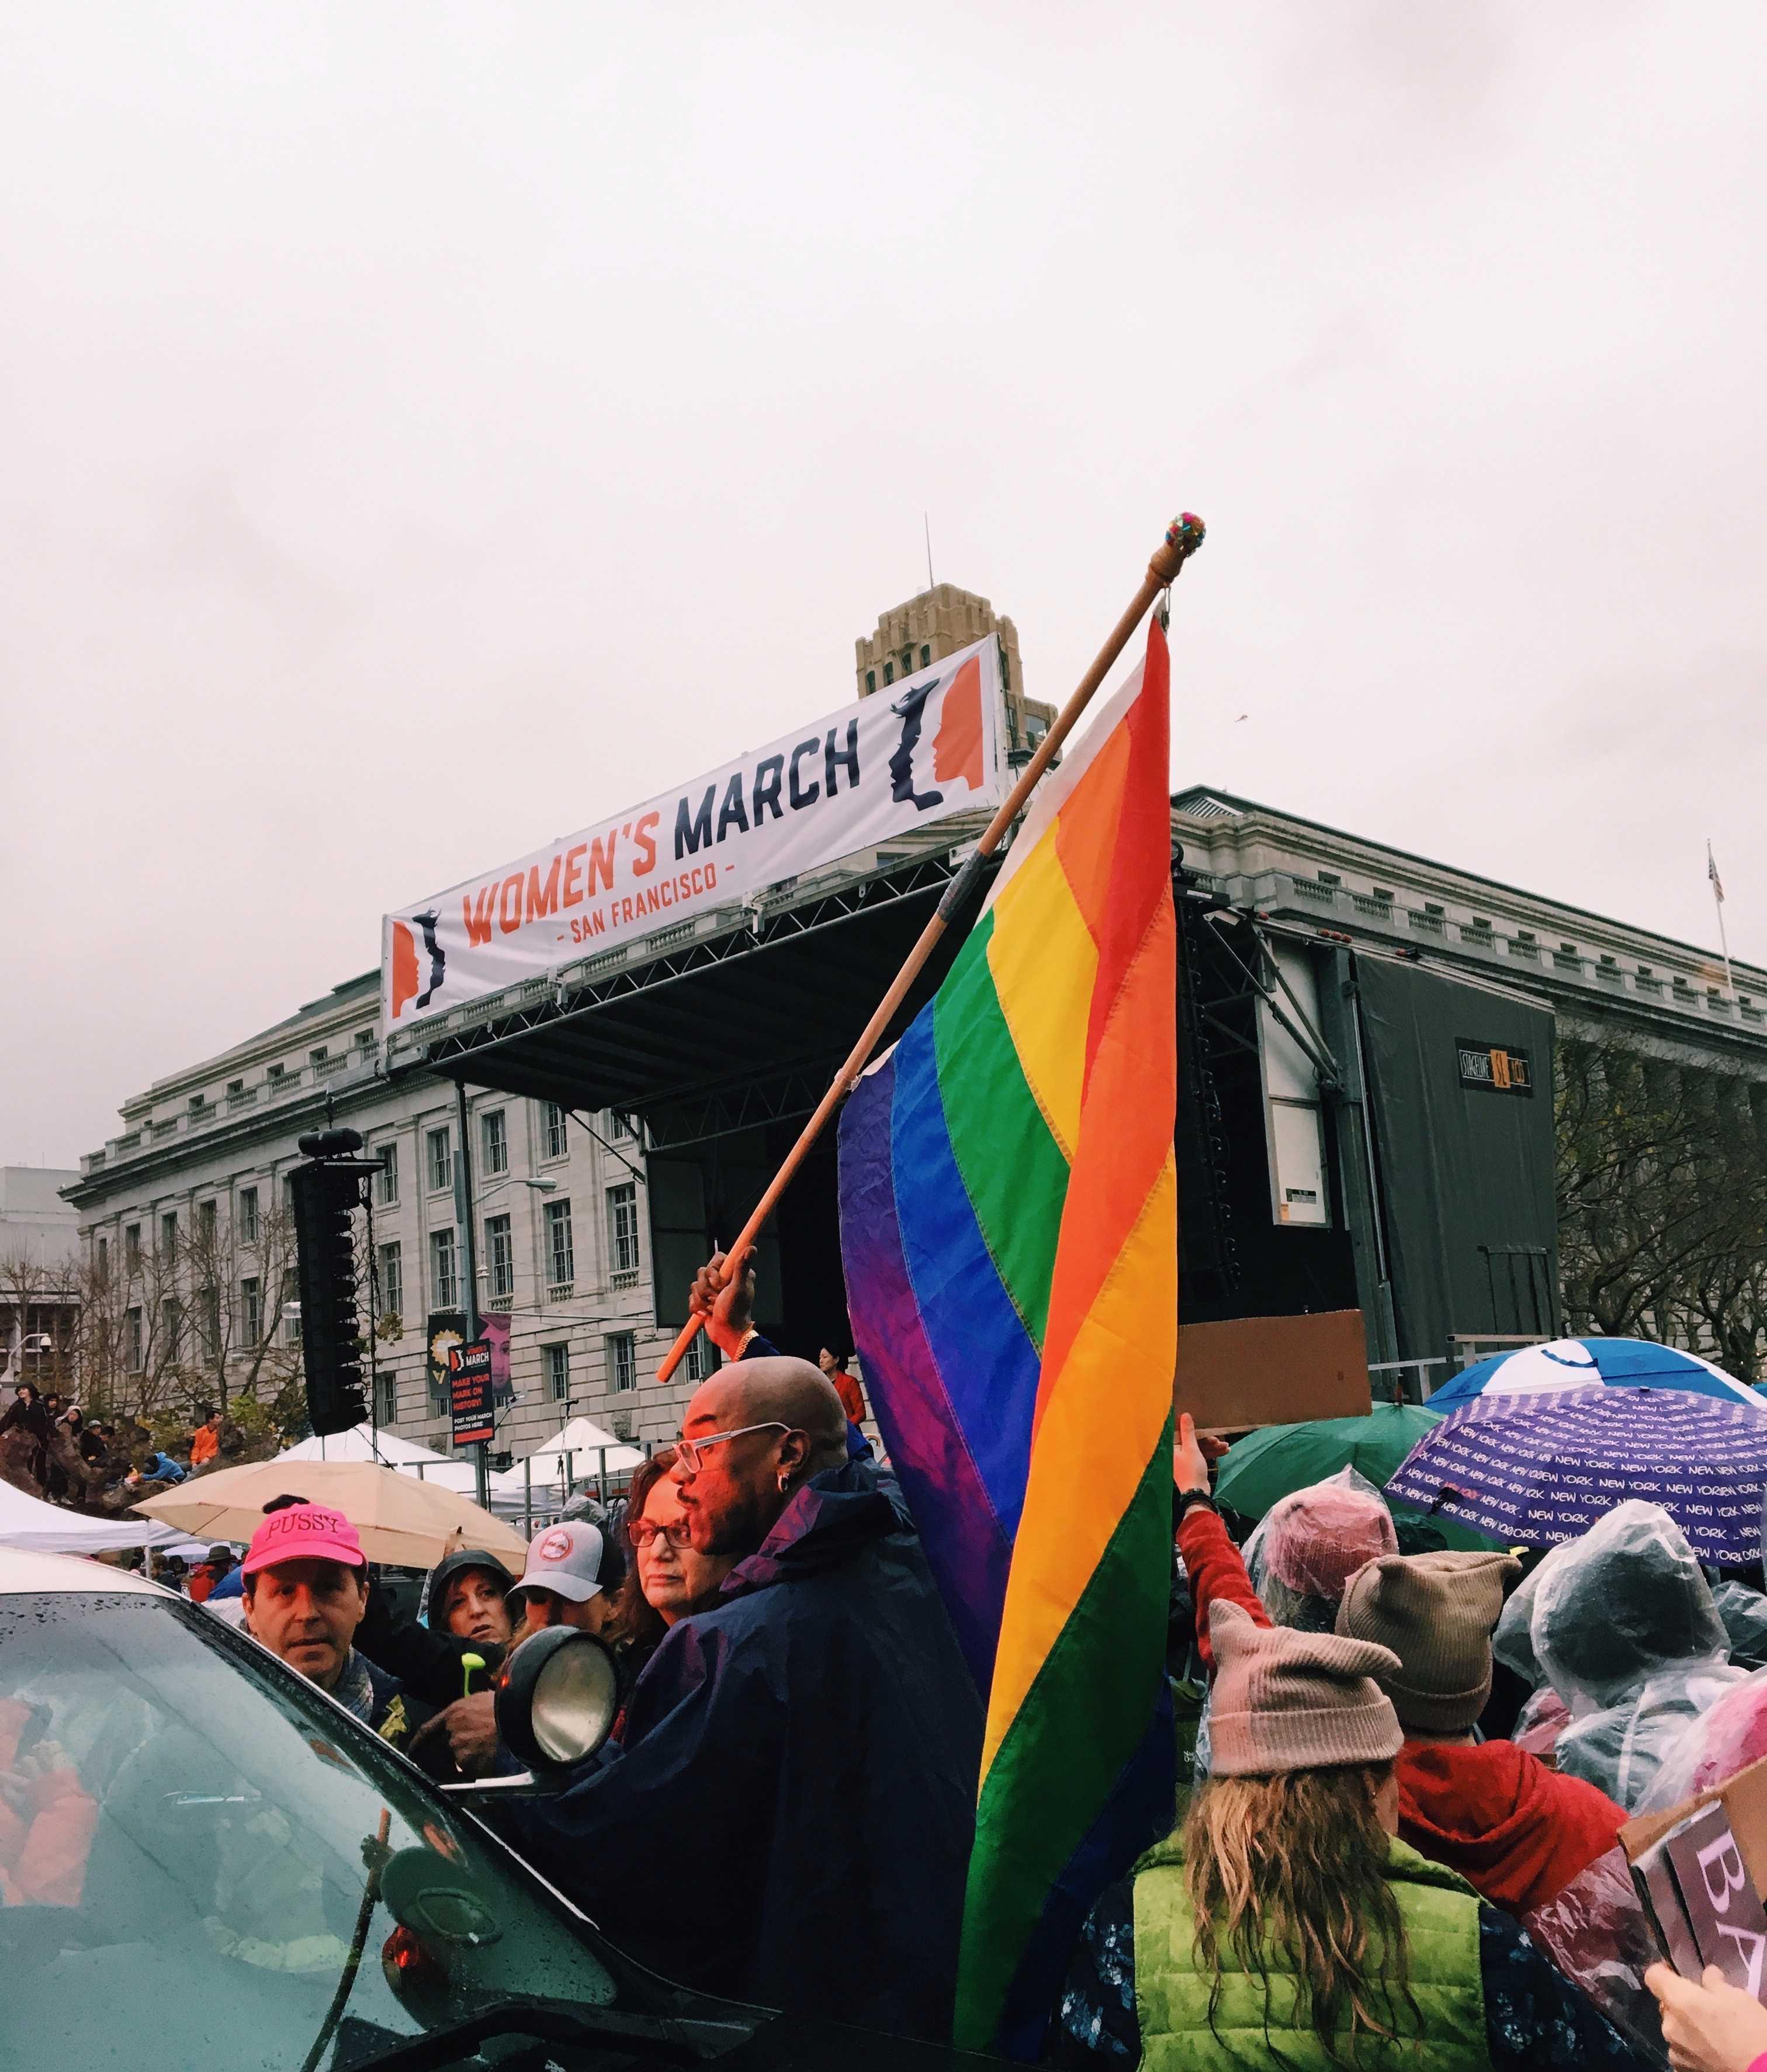 San Francisco Women's March, Jan. 21, 2017. Photo courtesy of Michaela Fogarty.